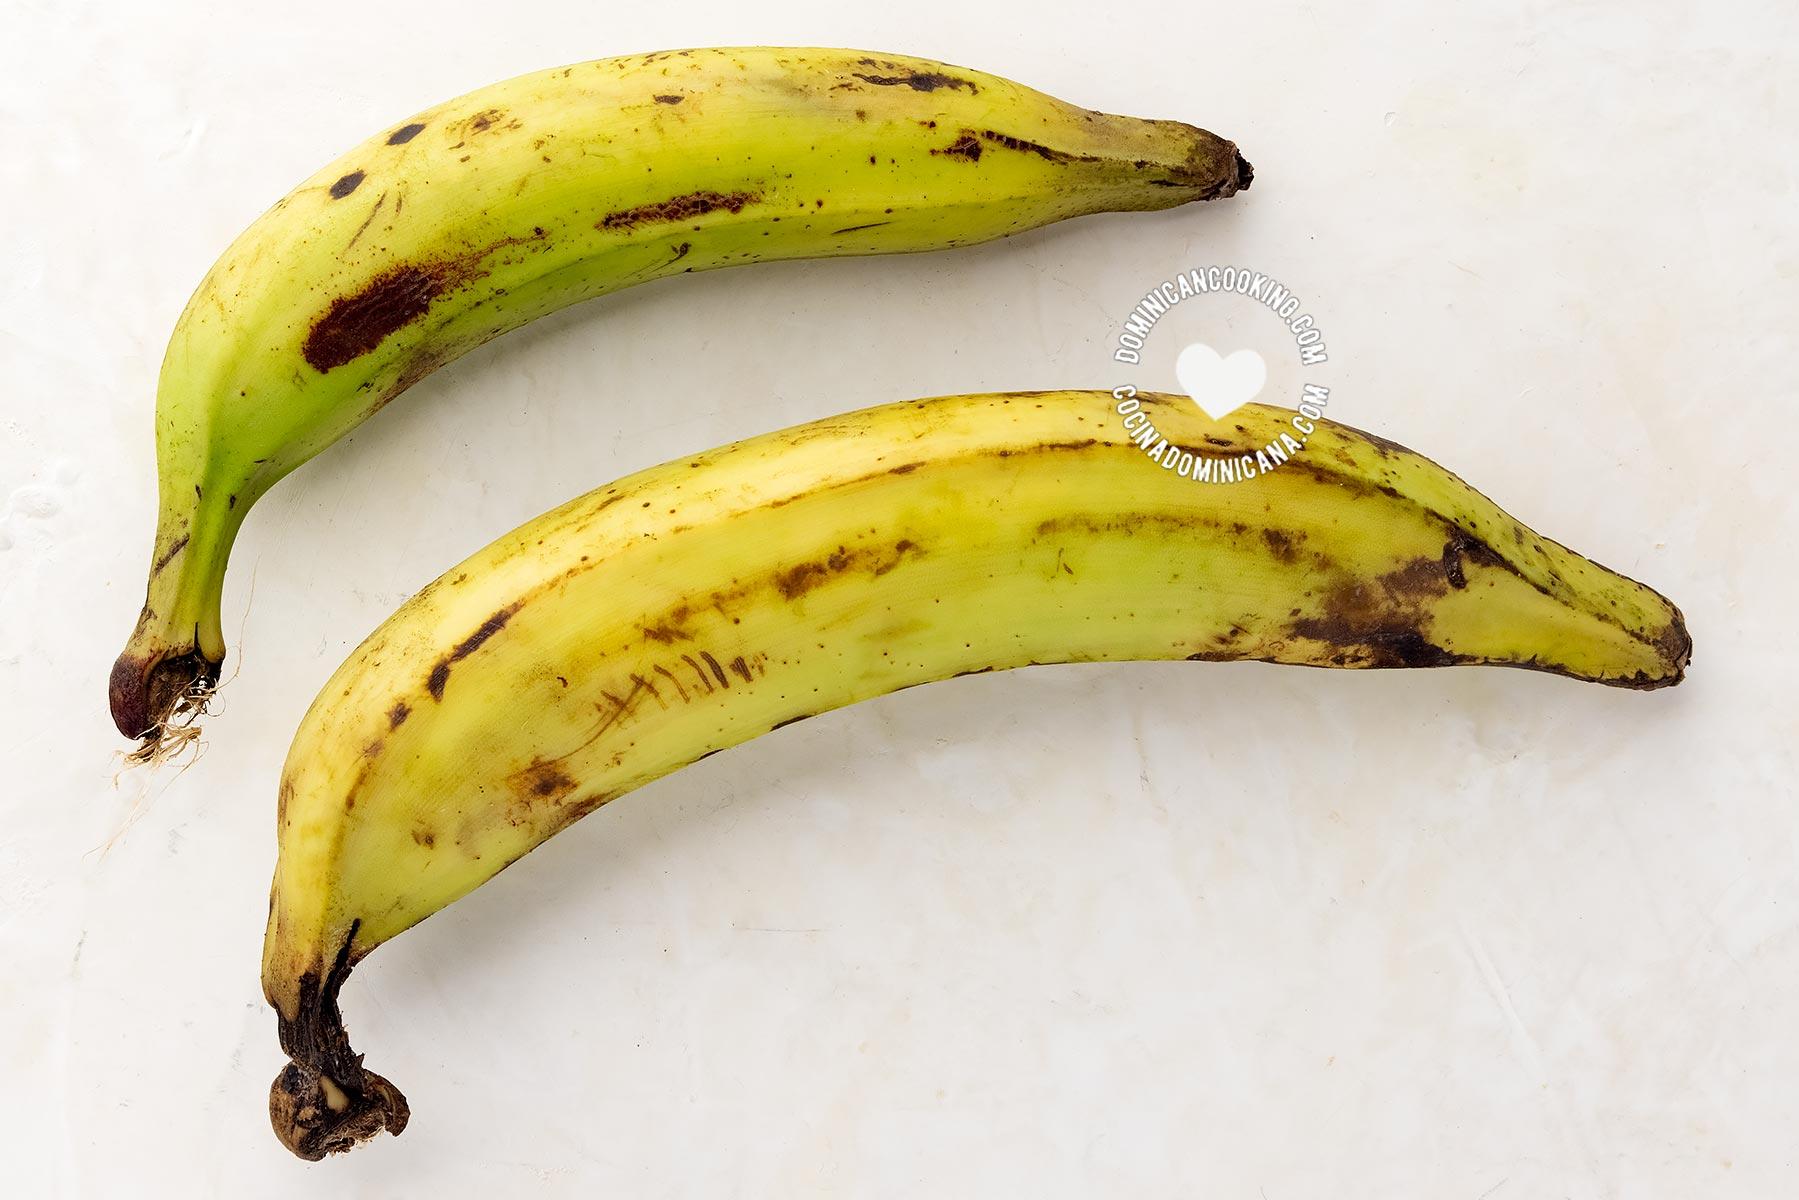 2 plátanos de diferentes tamaños